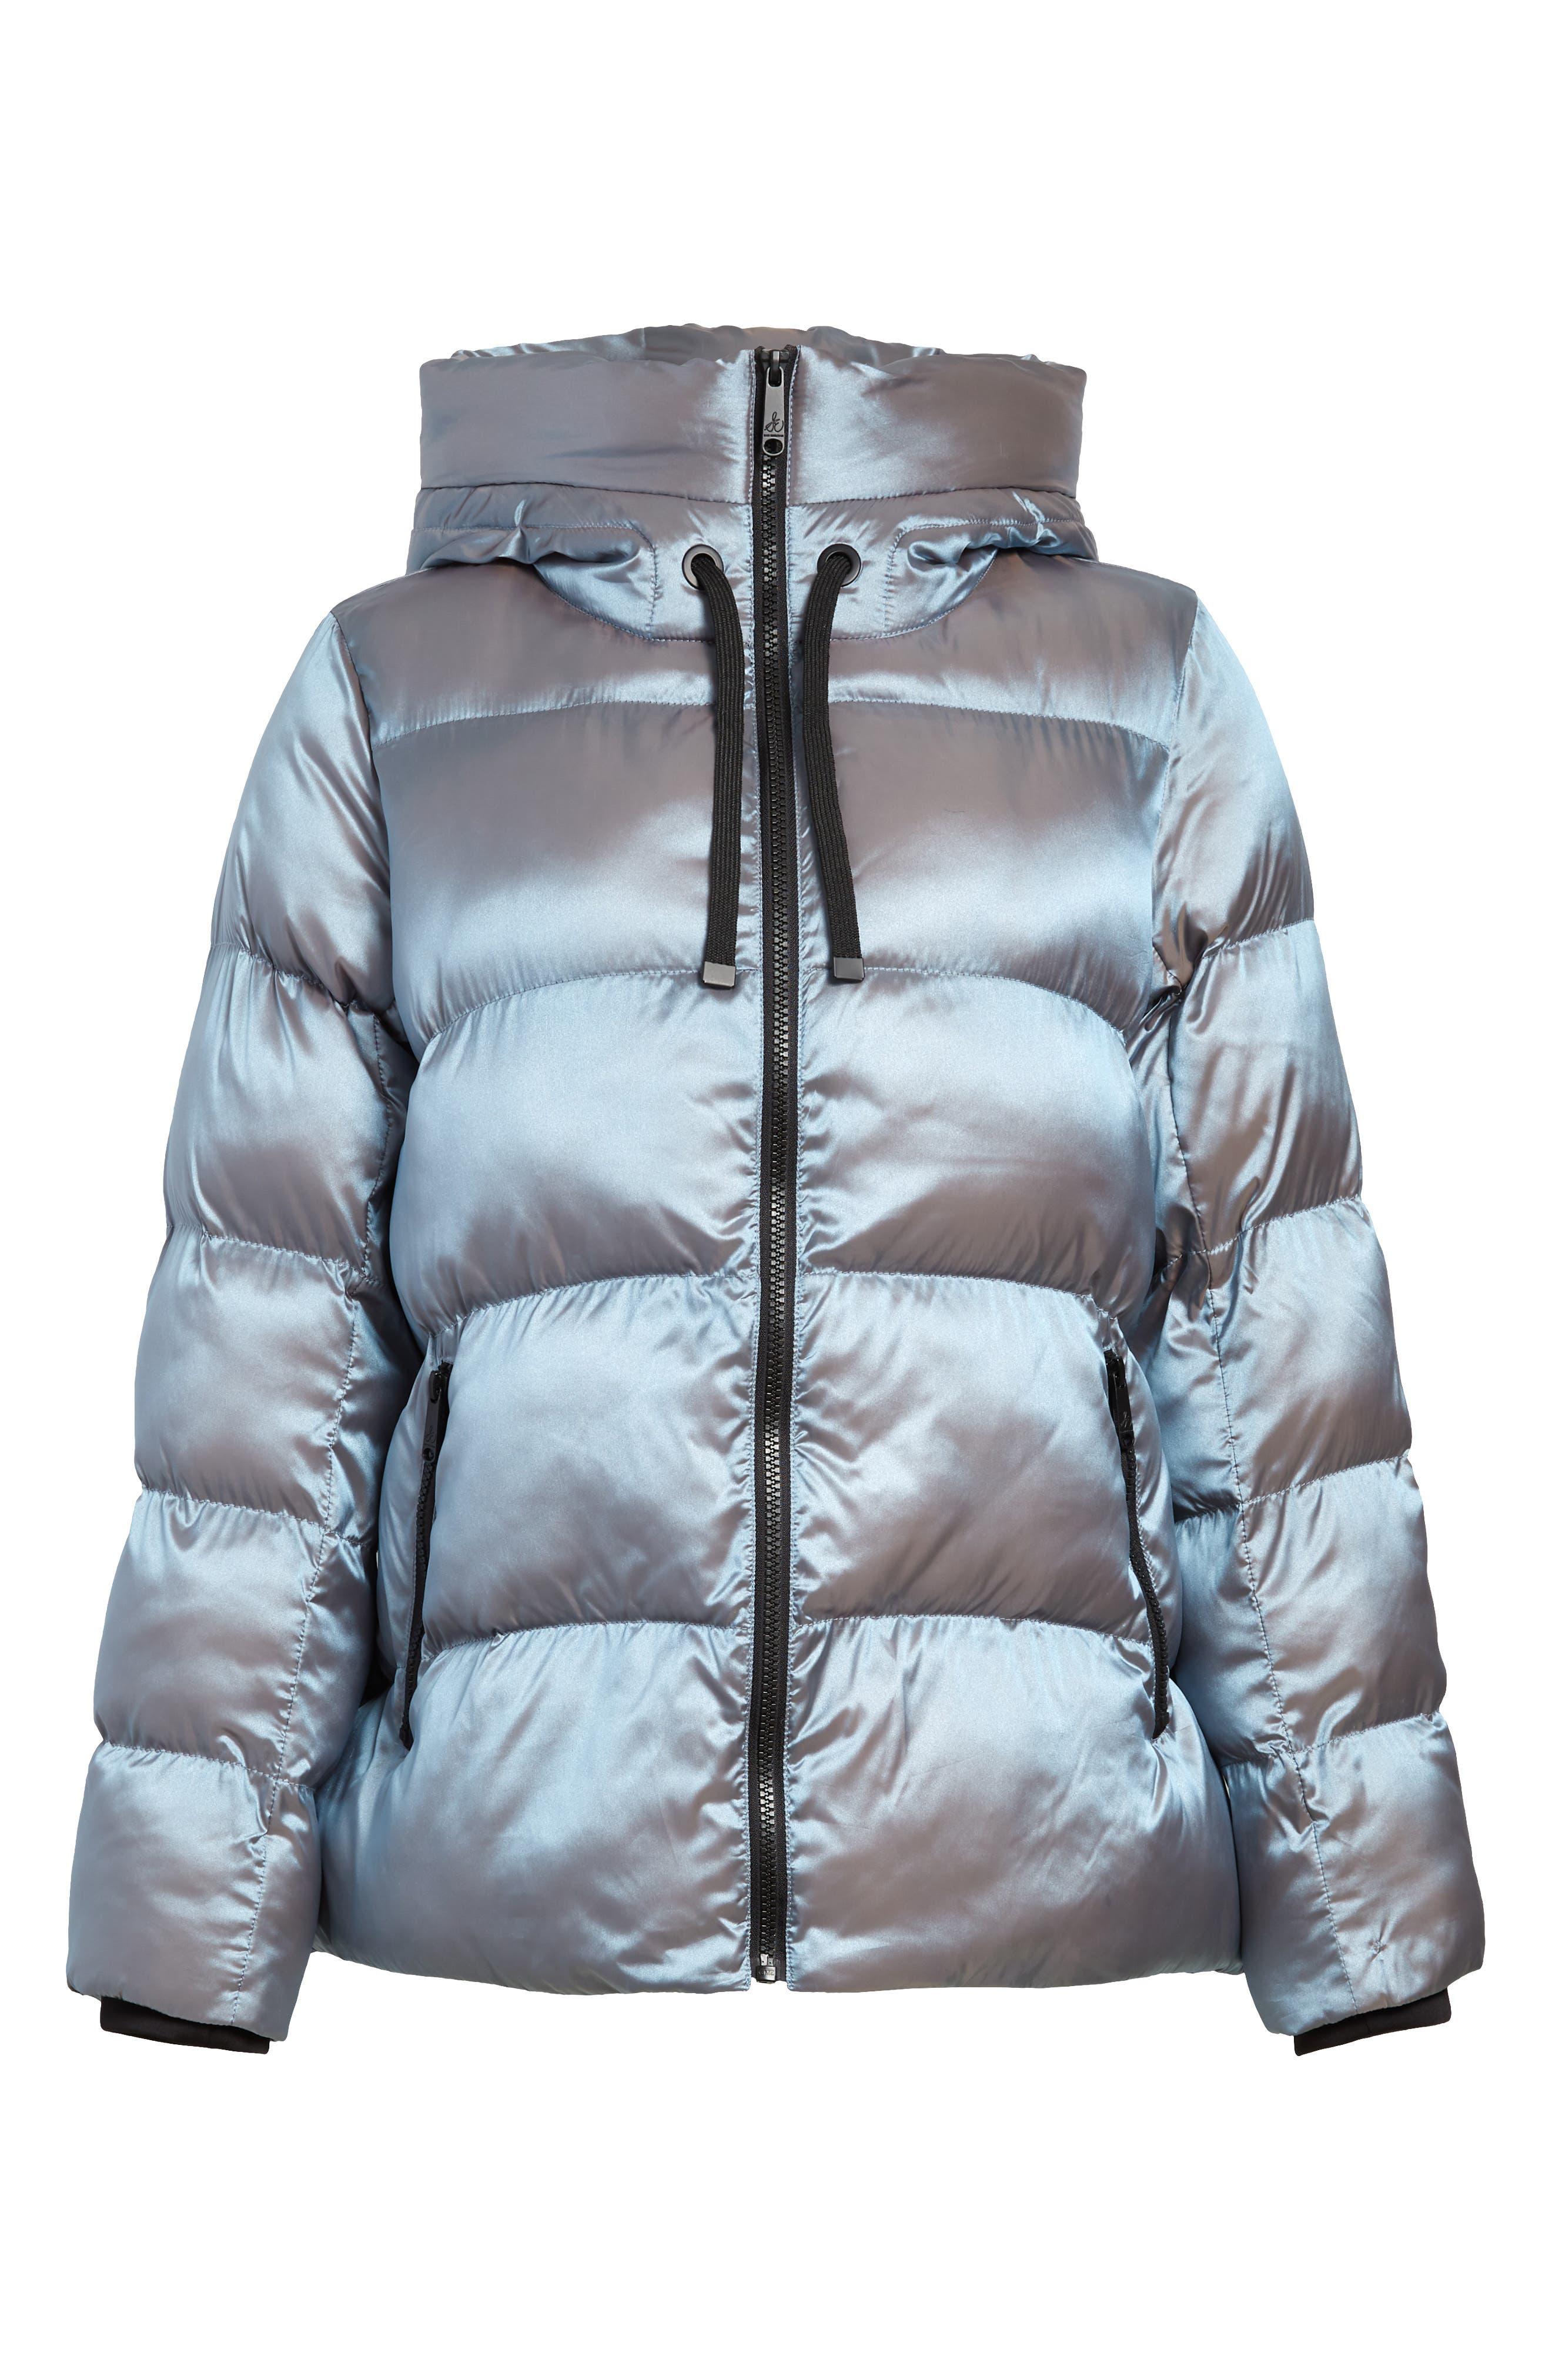 Sam Edelman Women S Sam Edelman Iridescent Water Repellent Hooded Puffer Jacket Size Small Blue From Nordstrom Com Shefinds